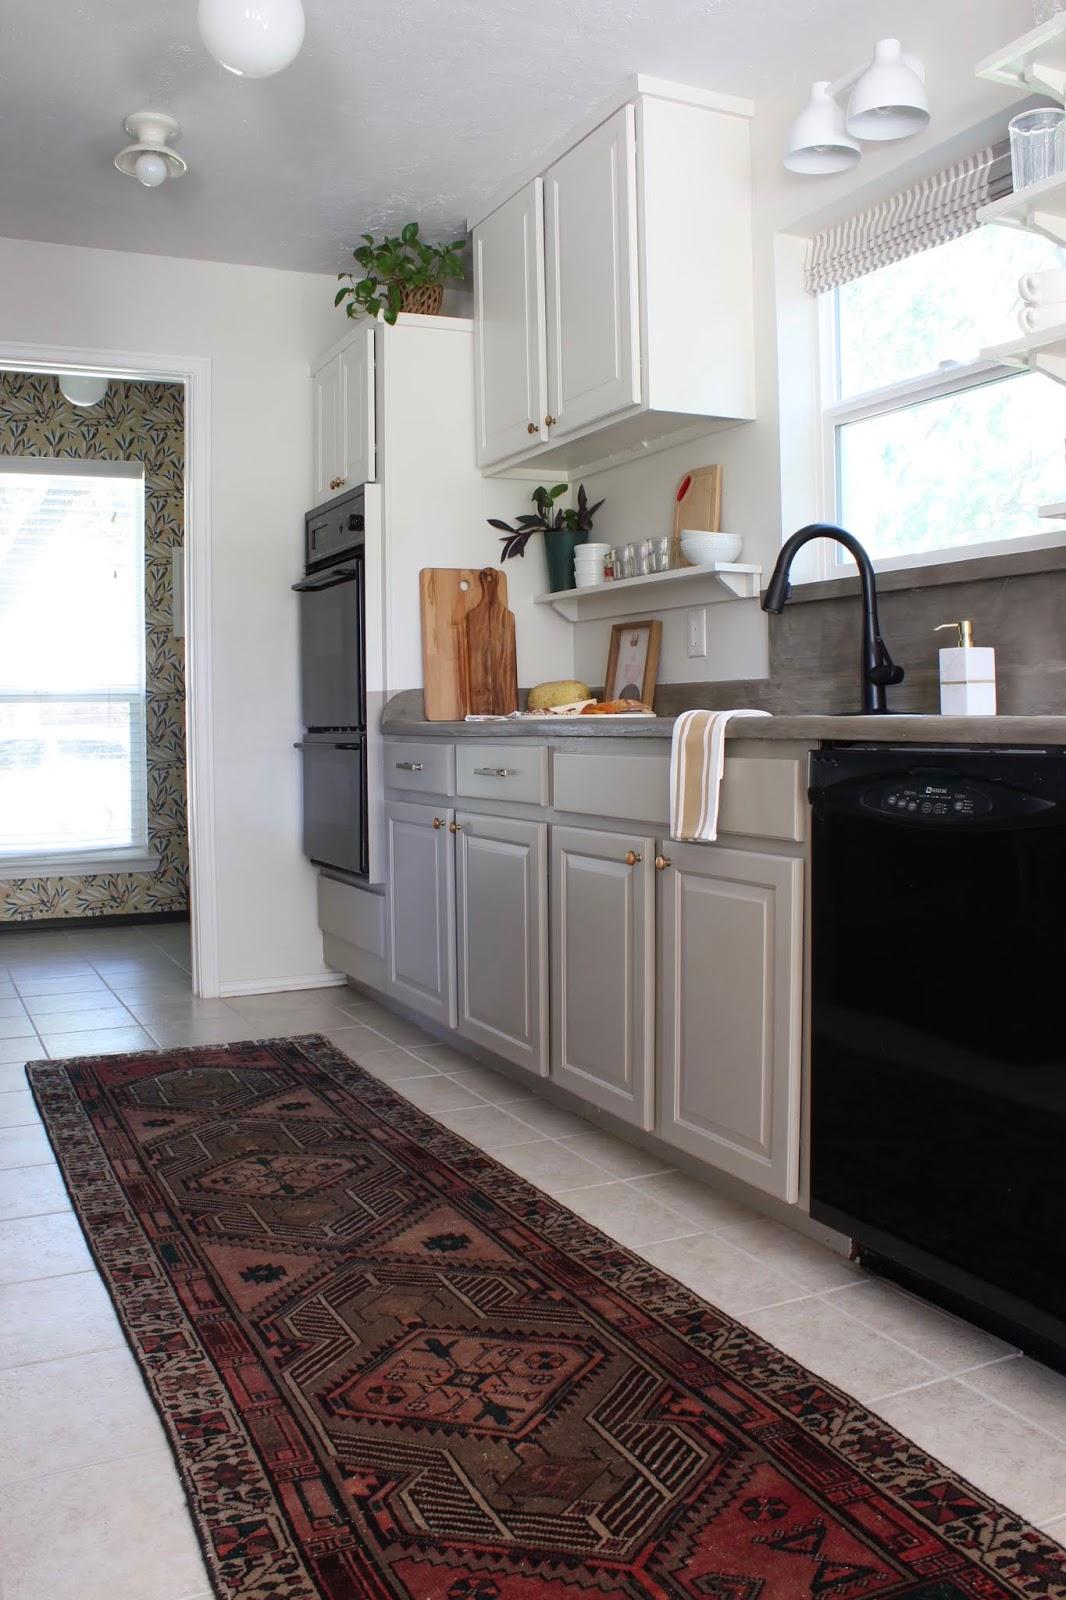 One room challenge budget kitchen makeover galley kitchen update | House Homemade